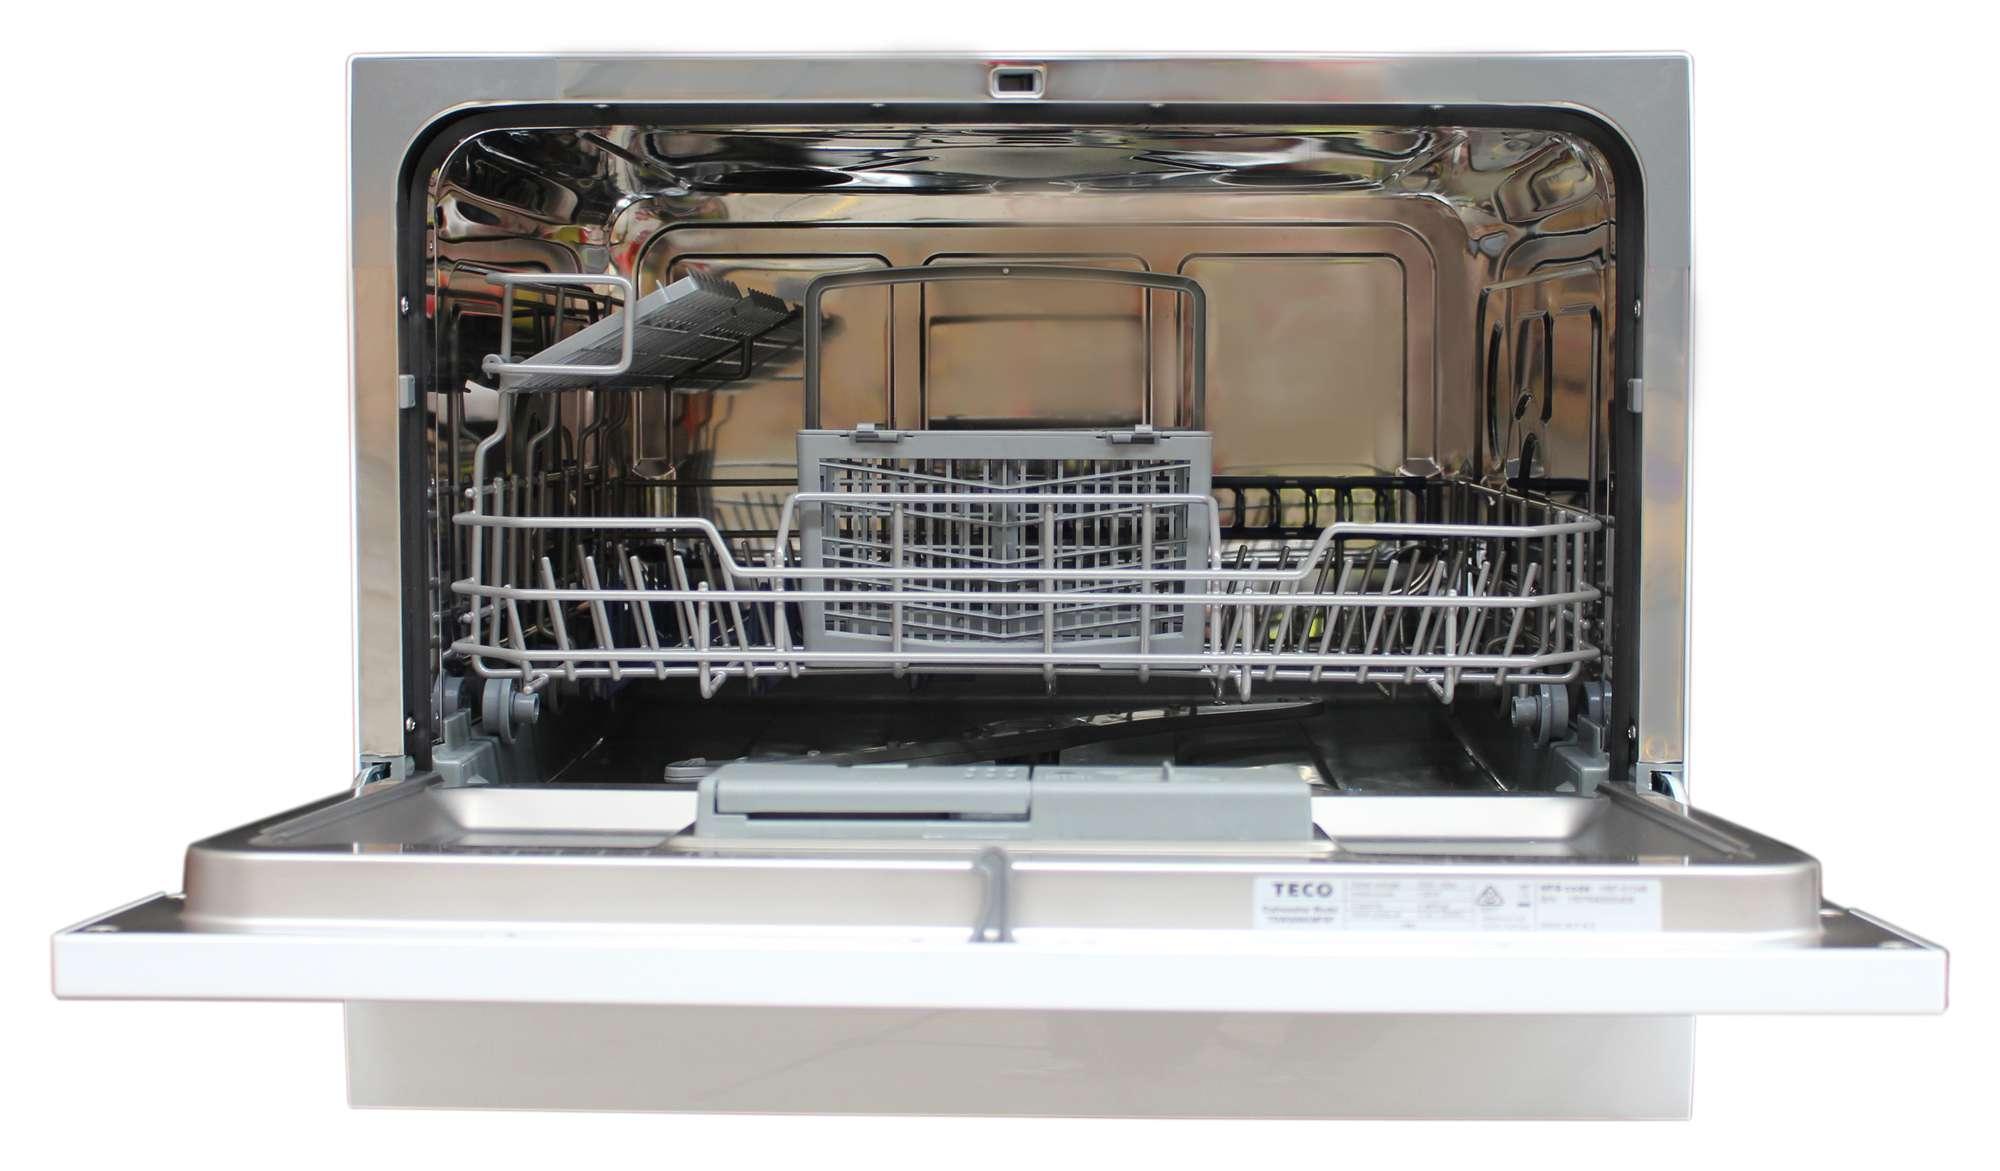 Stand Alone Dishwasher Stand Alone Dishwasher Decorate